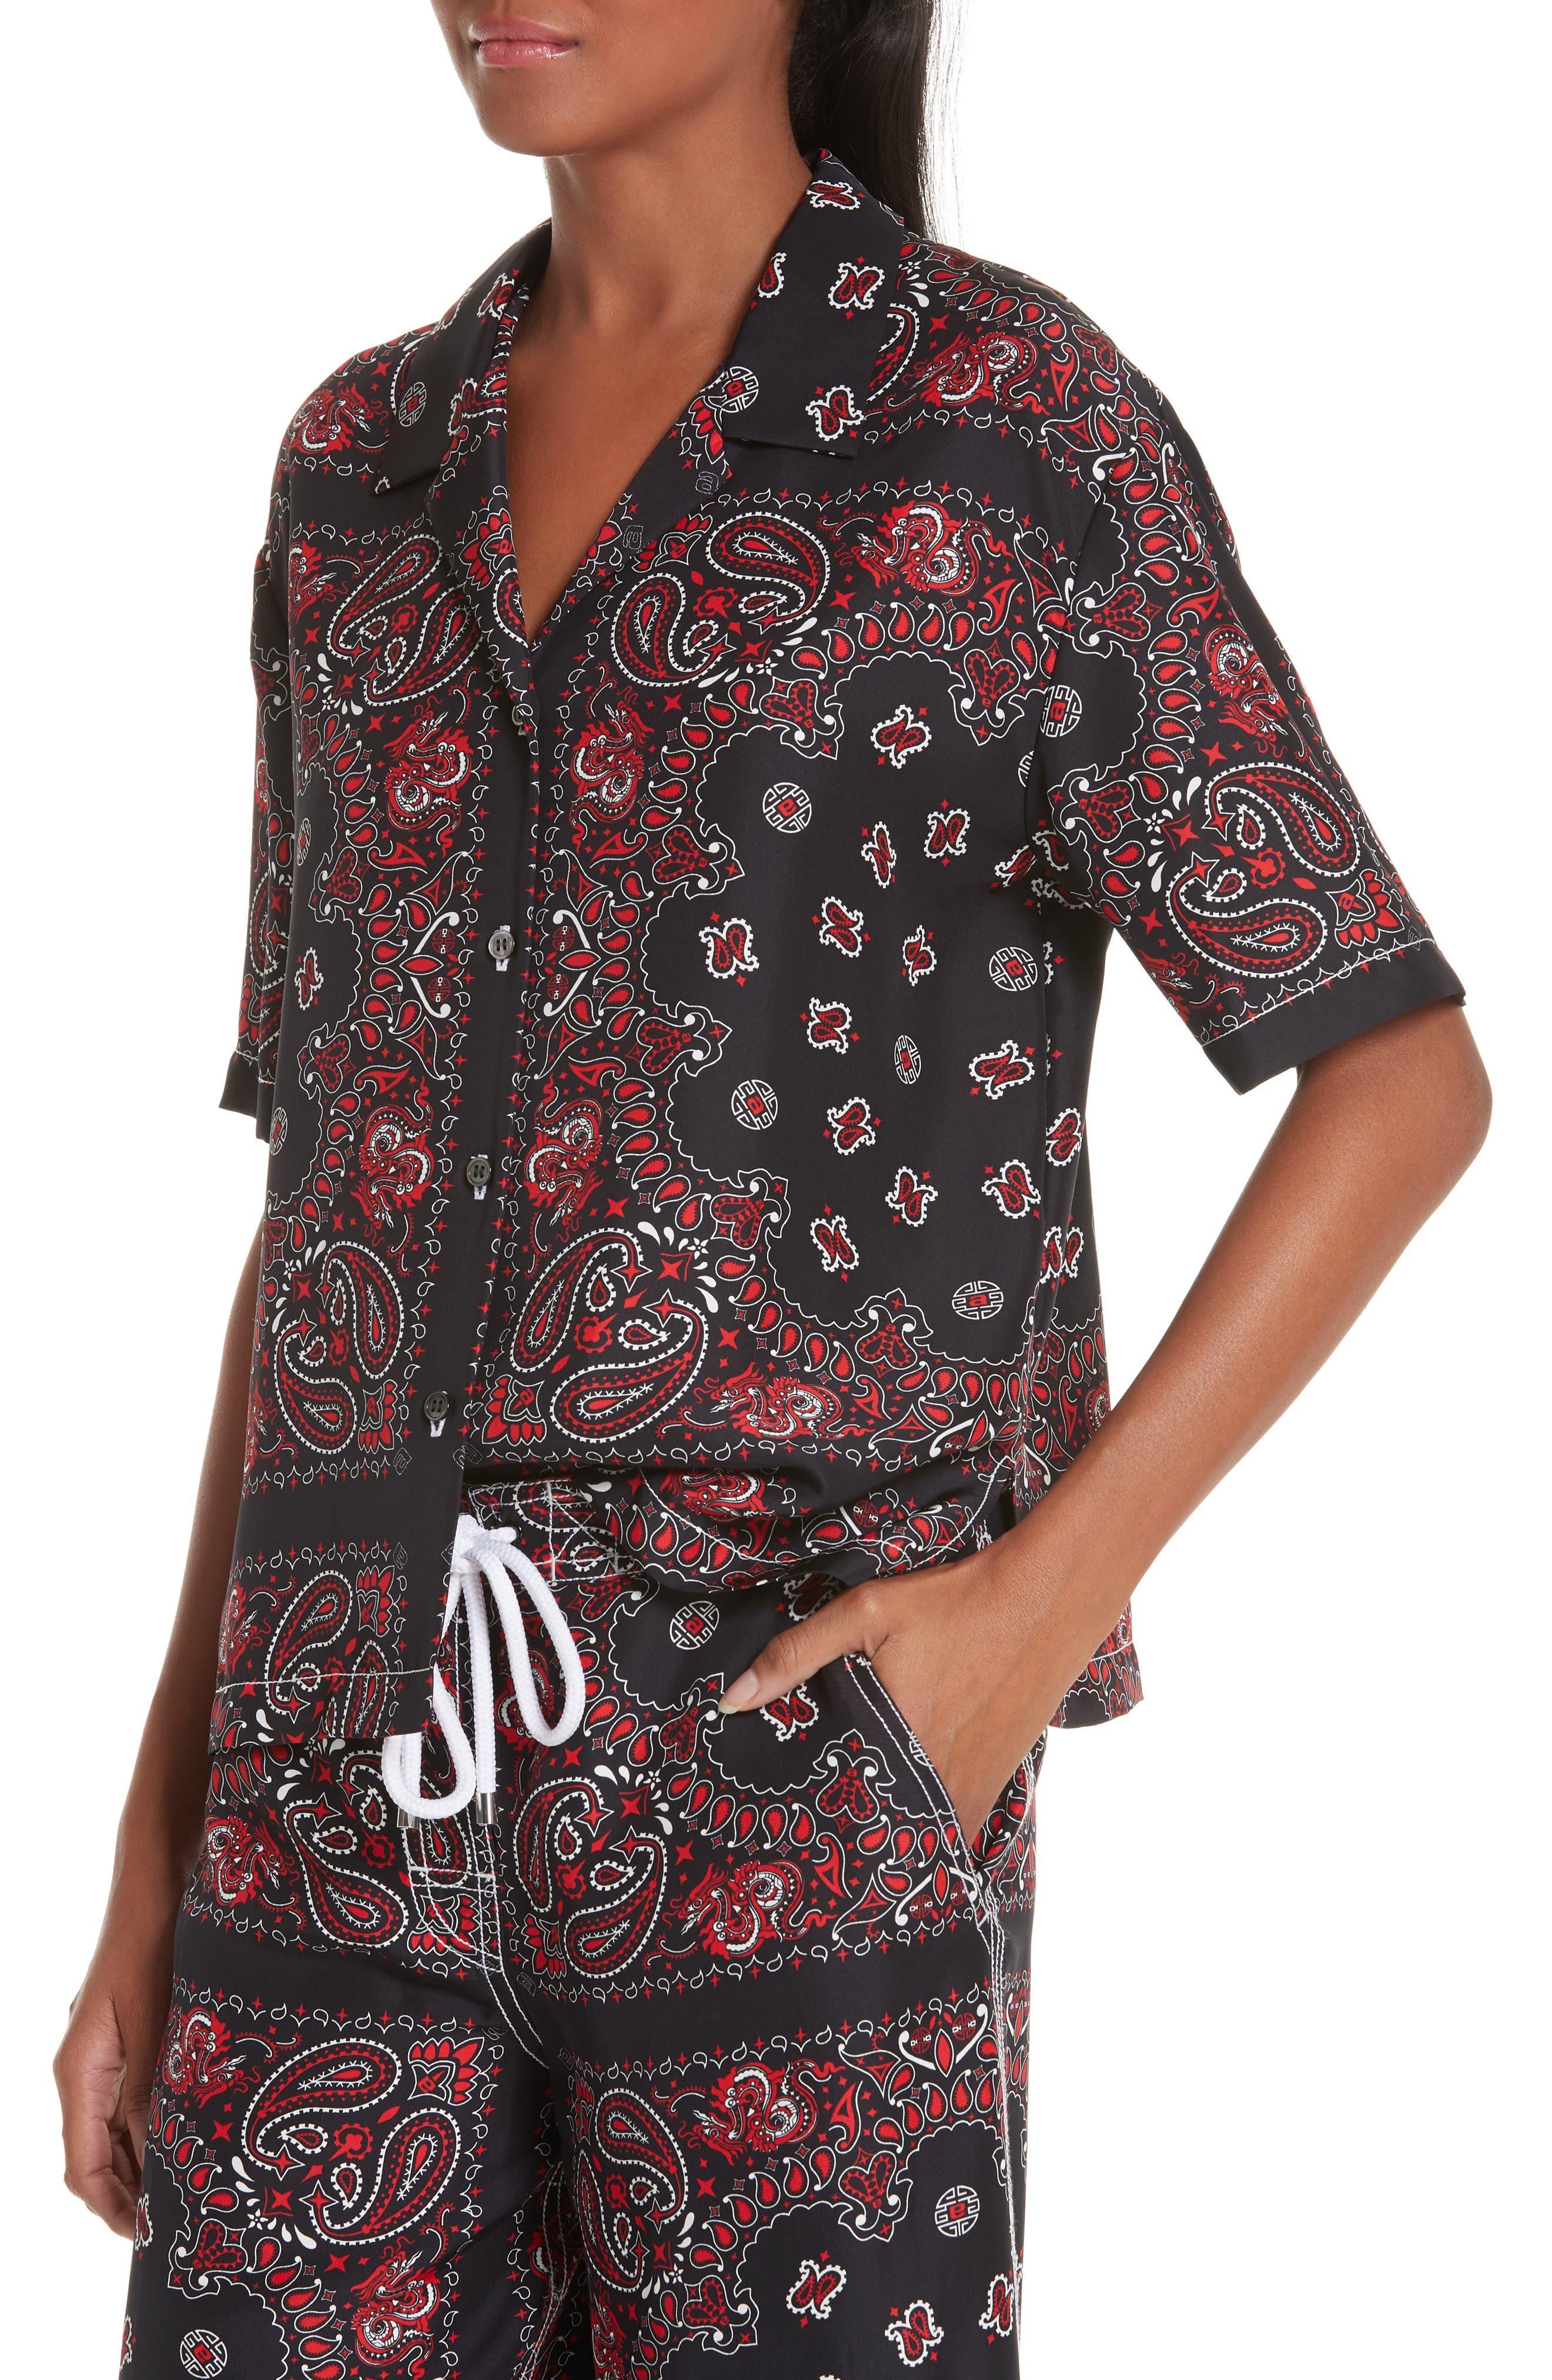 ALEXANDER WANG,                             Bandana Print Silk Shirt,                             Alternate thumbnail 5, color,                             BLACK/ RED